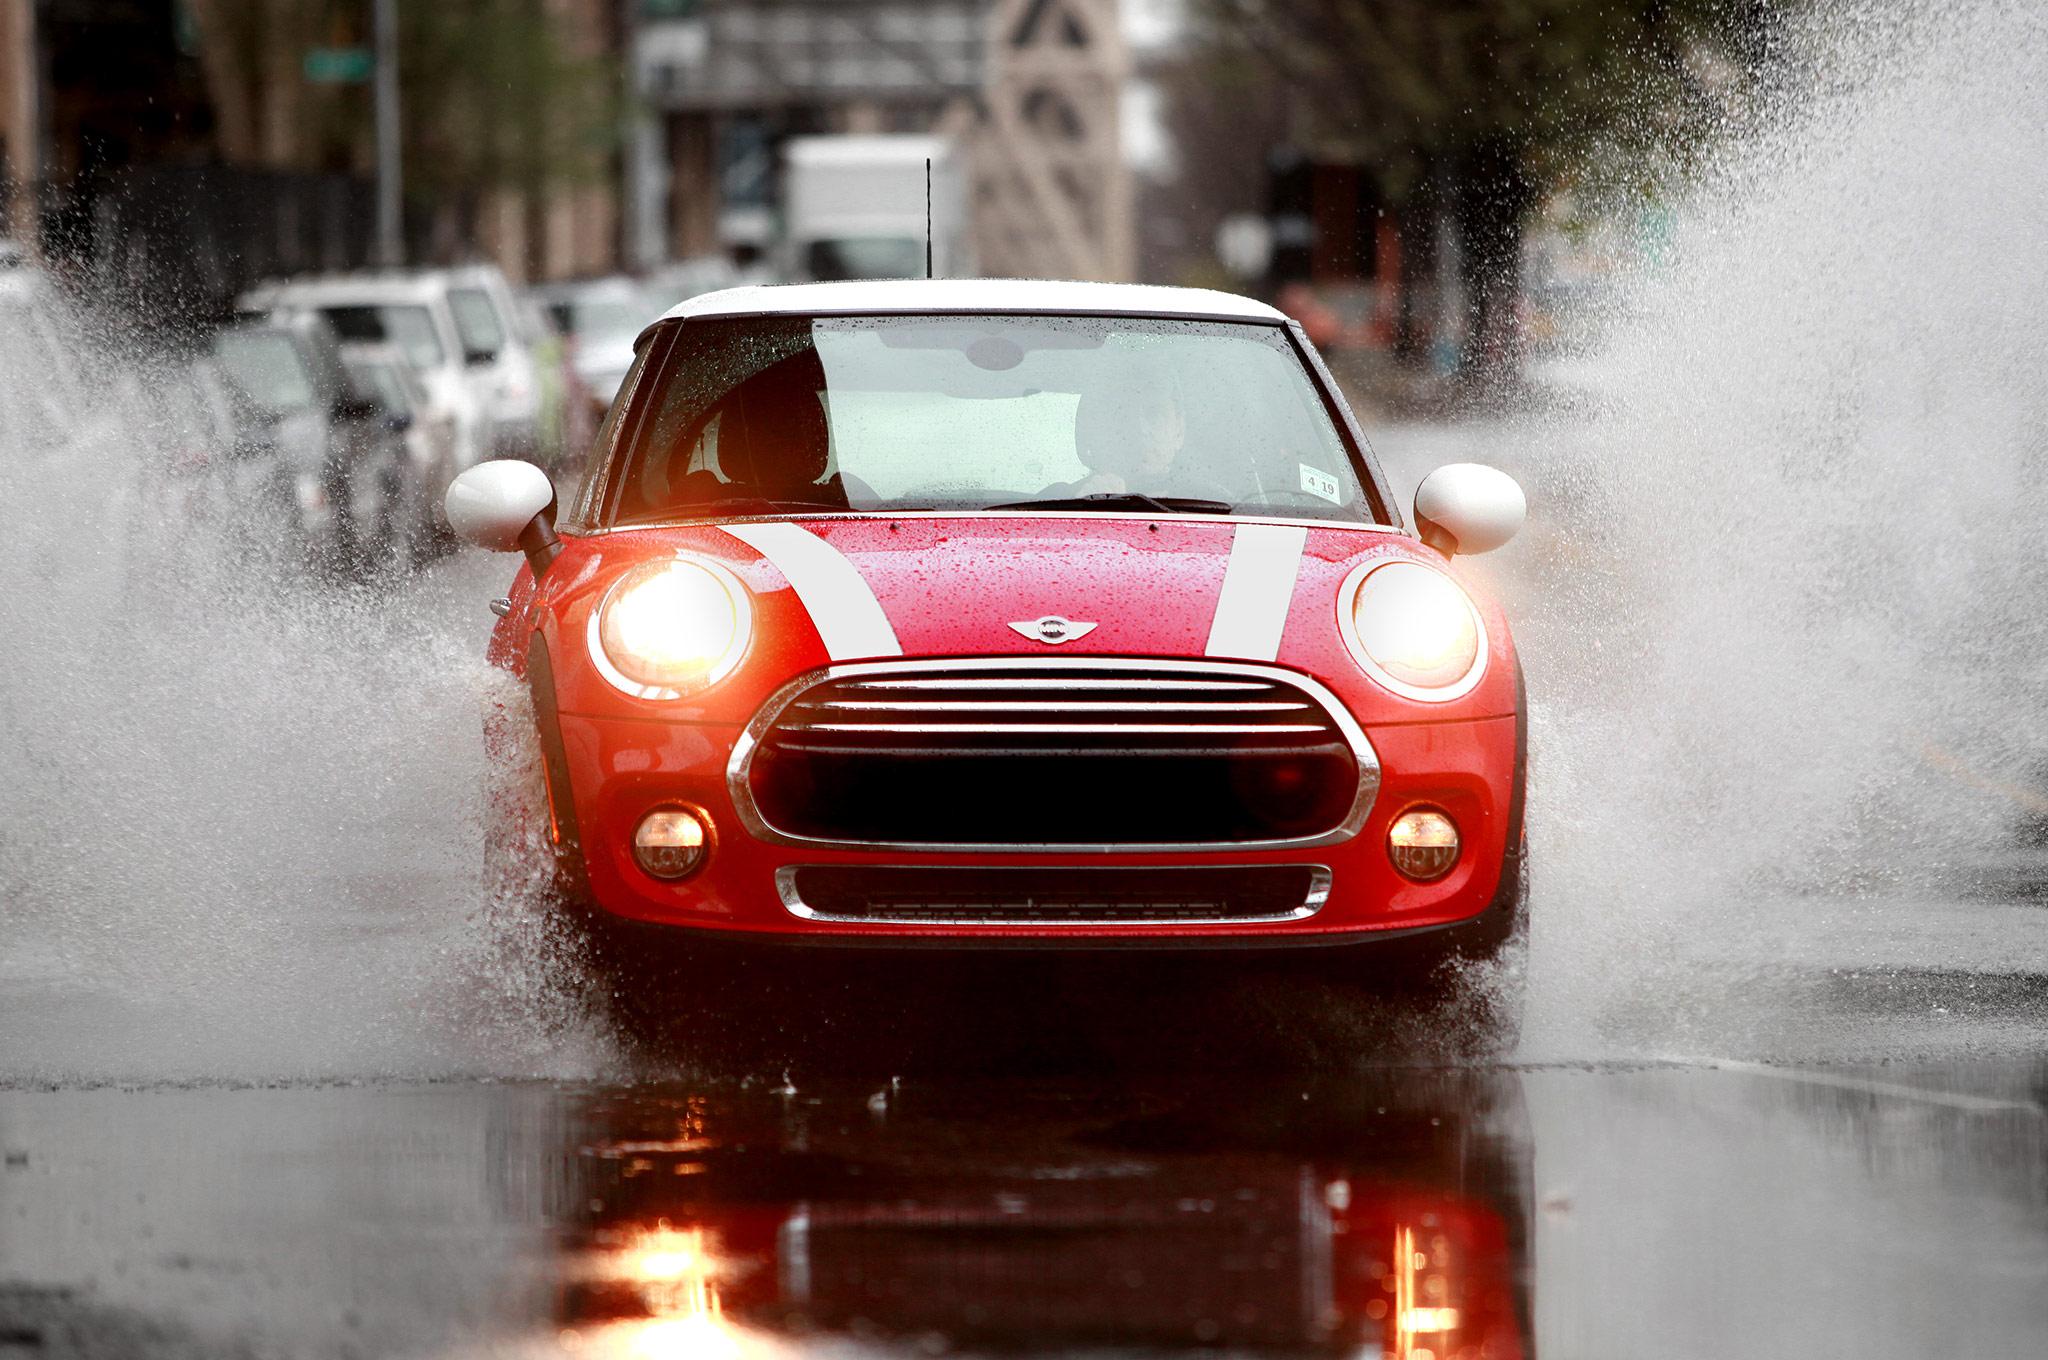 2014 Mini Cooper Front Splashing Puddle1